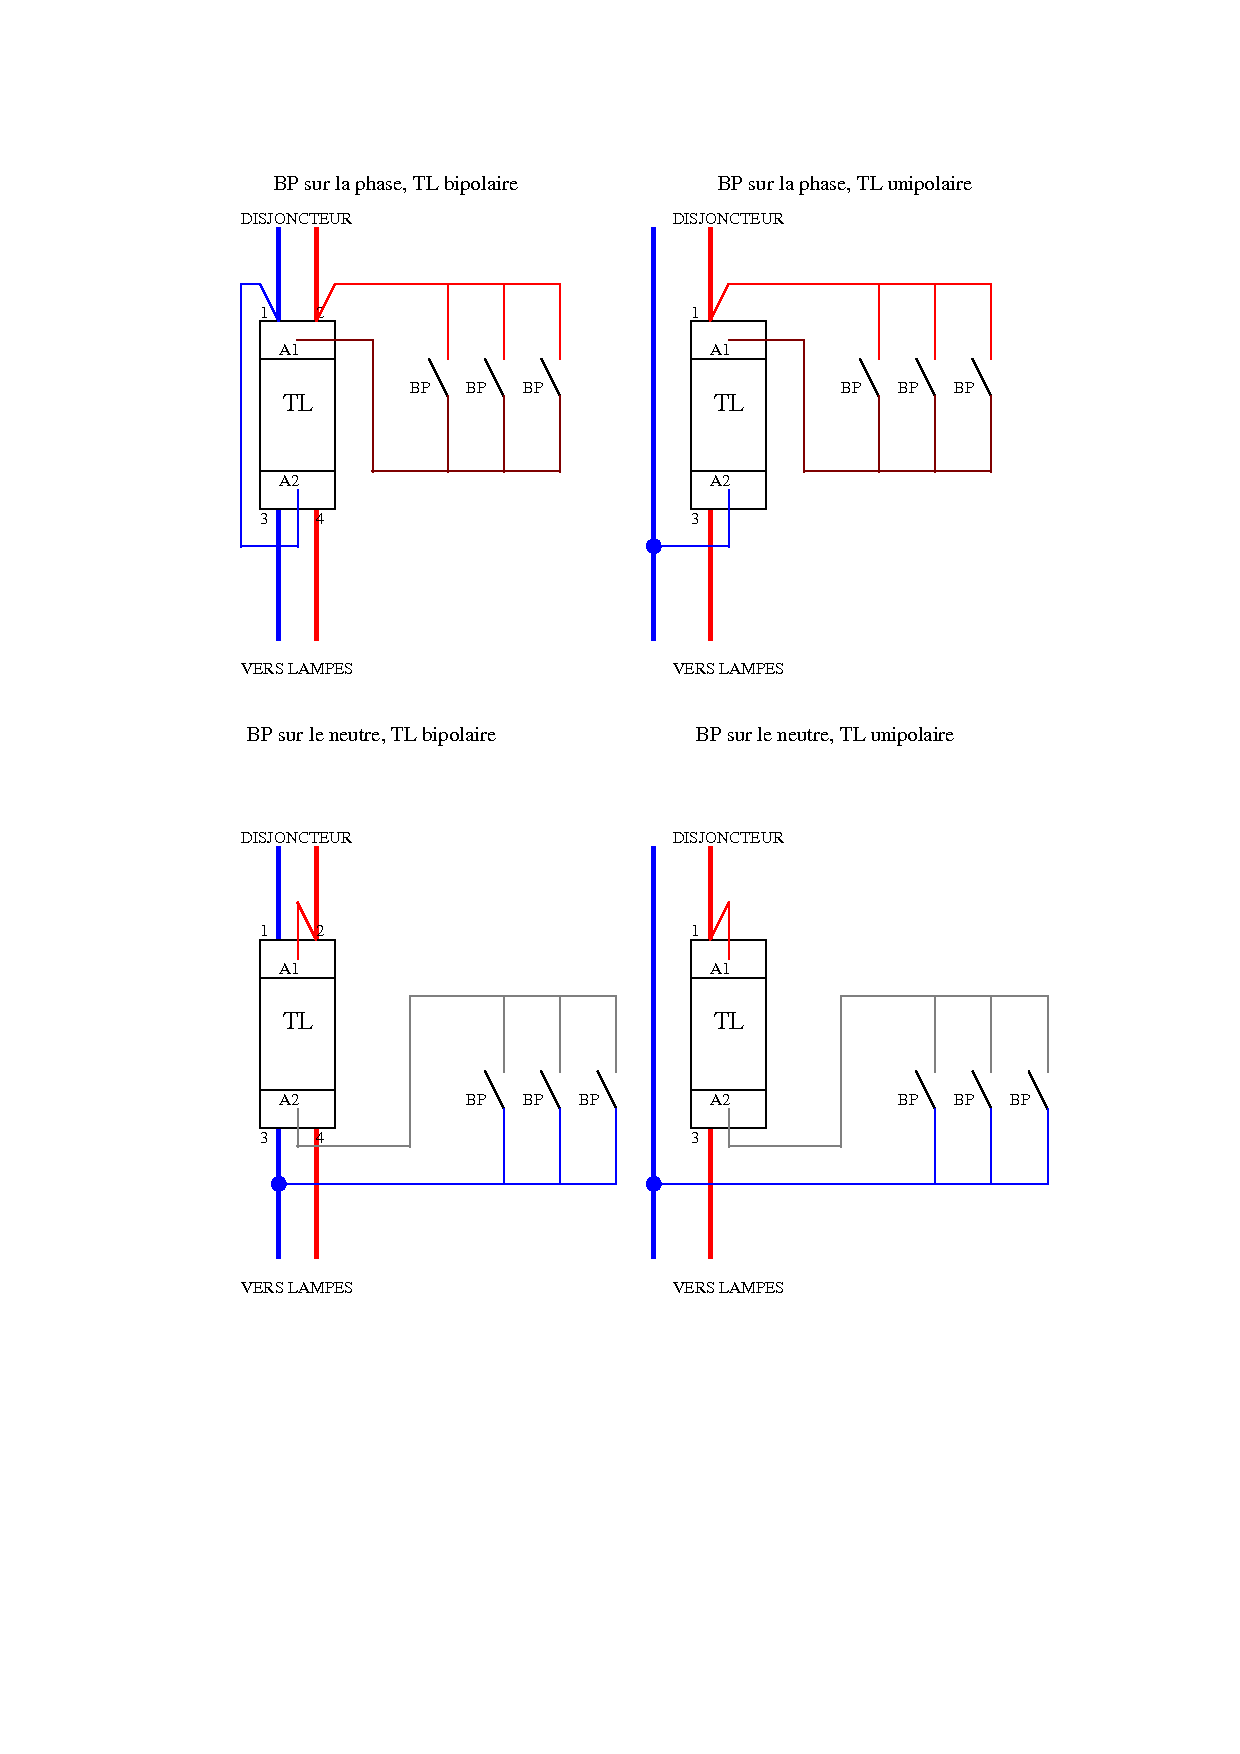 Shema Cablage Telerupteur Merlin Gerin Mu Forum Electricite Systeme D Electricite Schema Electrique Electricite Generale